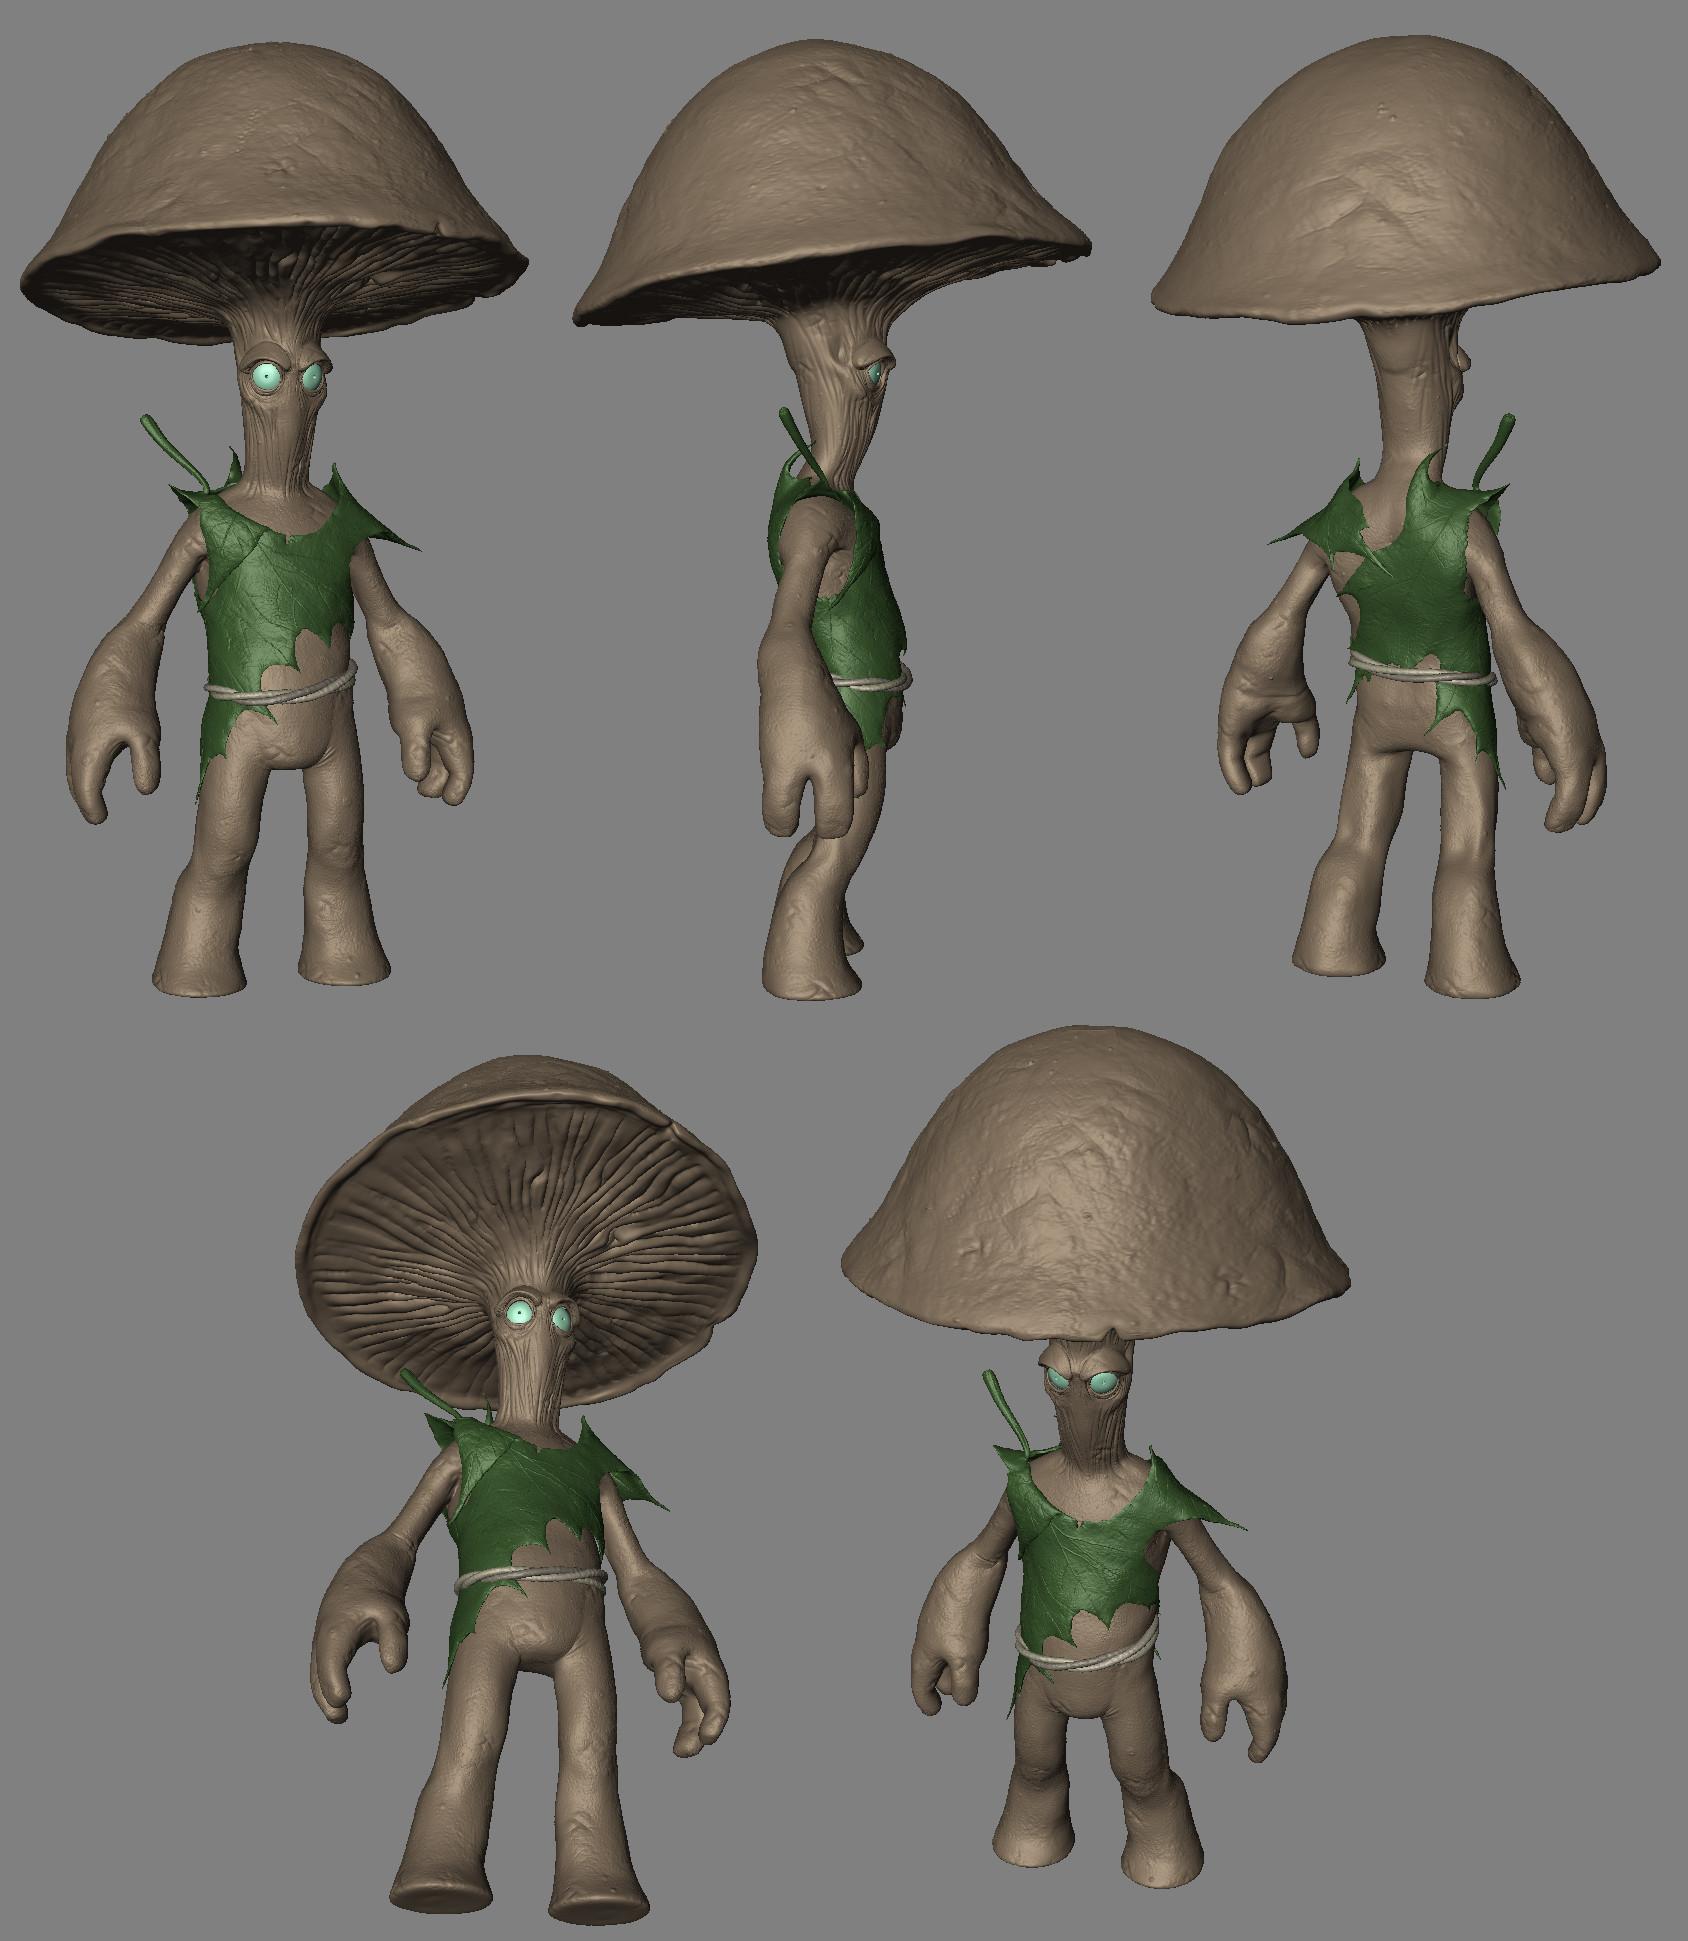 Kolby jukes mushroom man